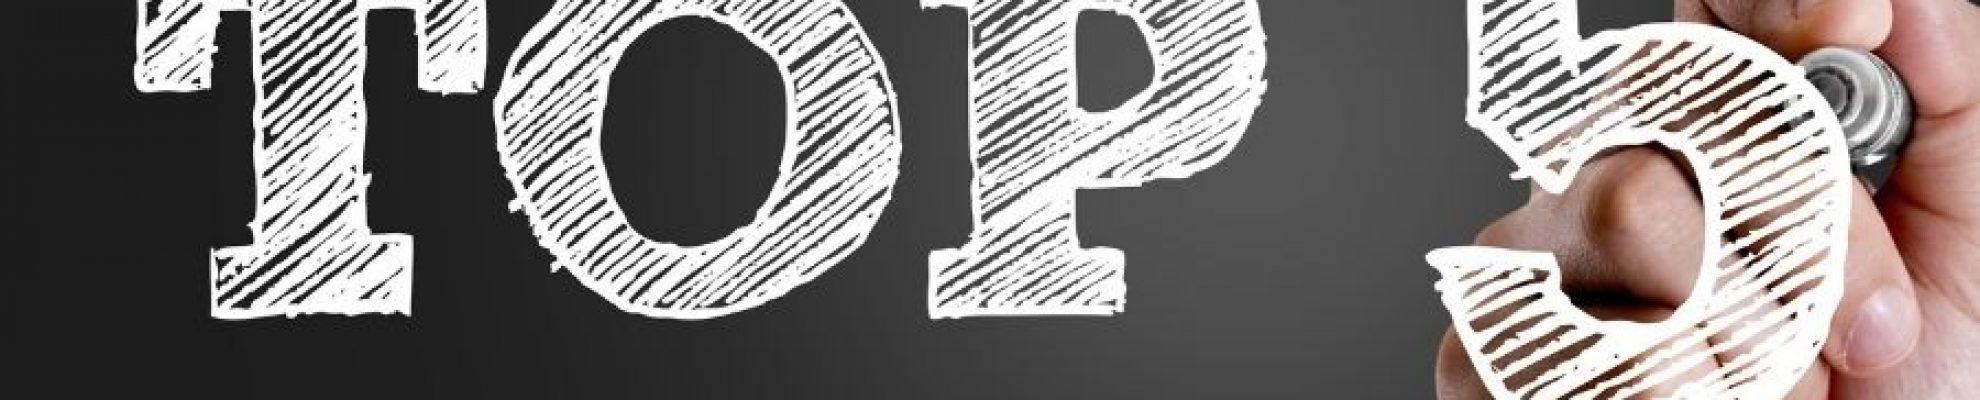 Top cinq des outils BI